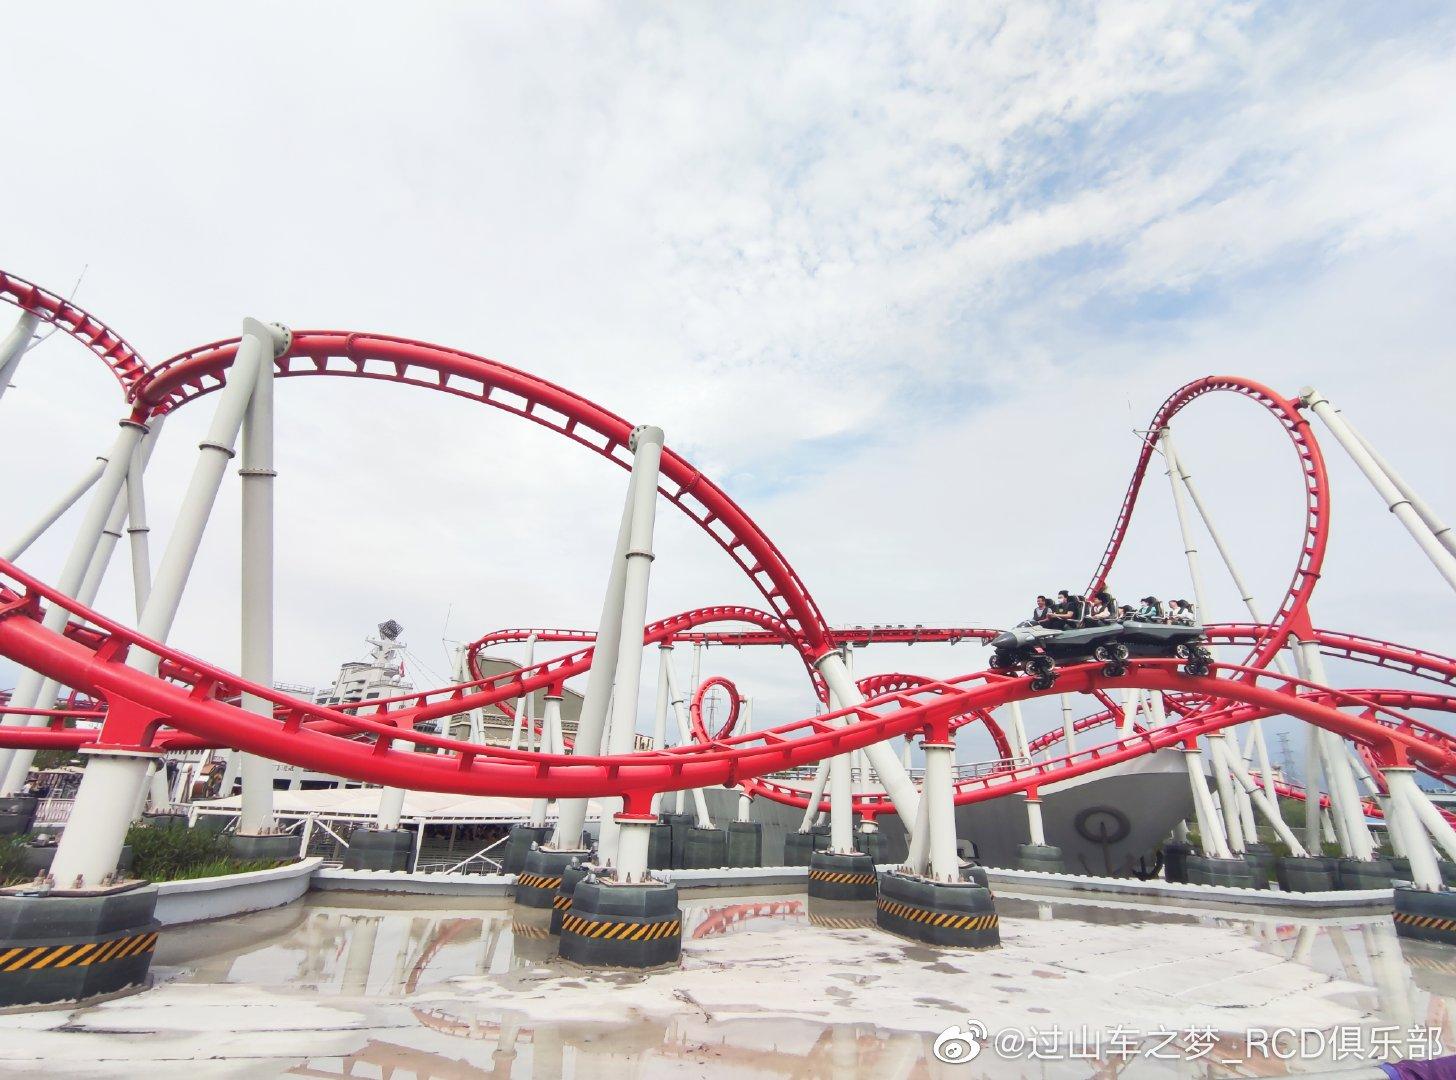 fantawild-theme-parks-14574300.jpg